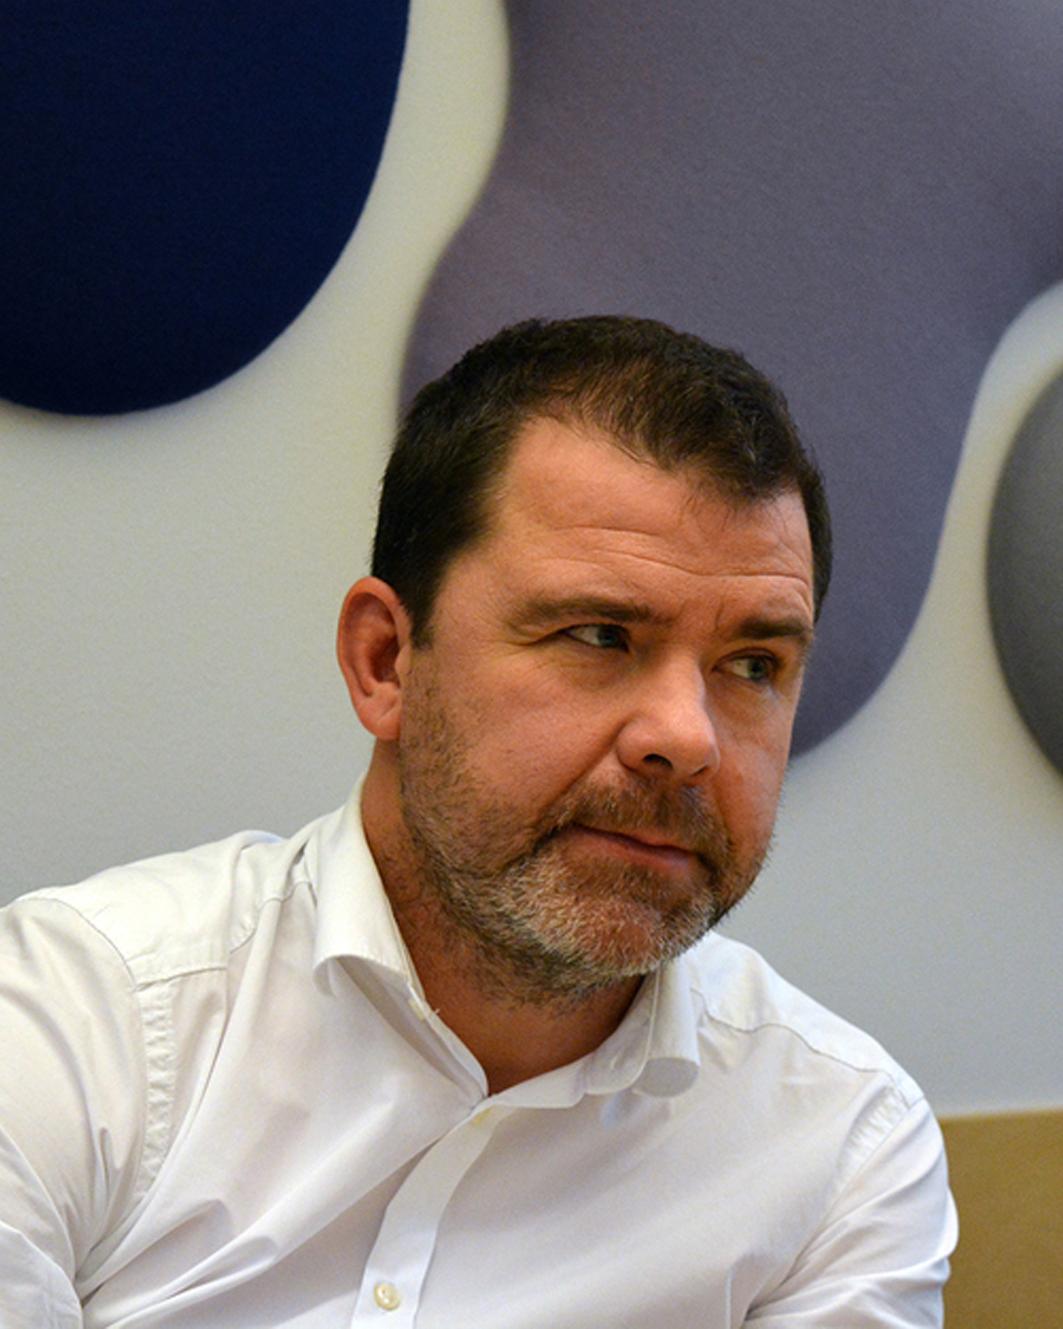 Johan Evenäs, PhD